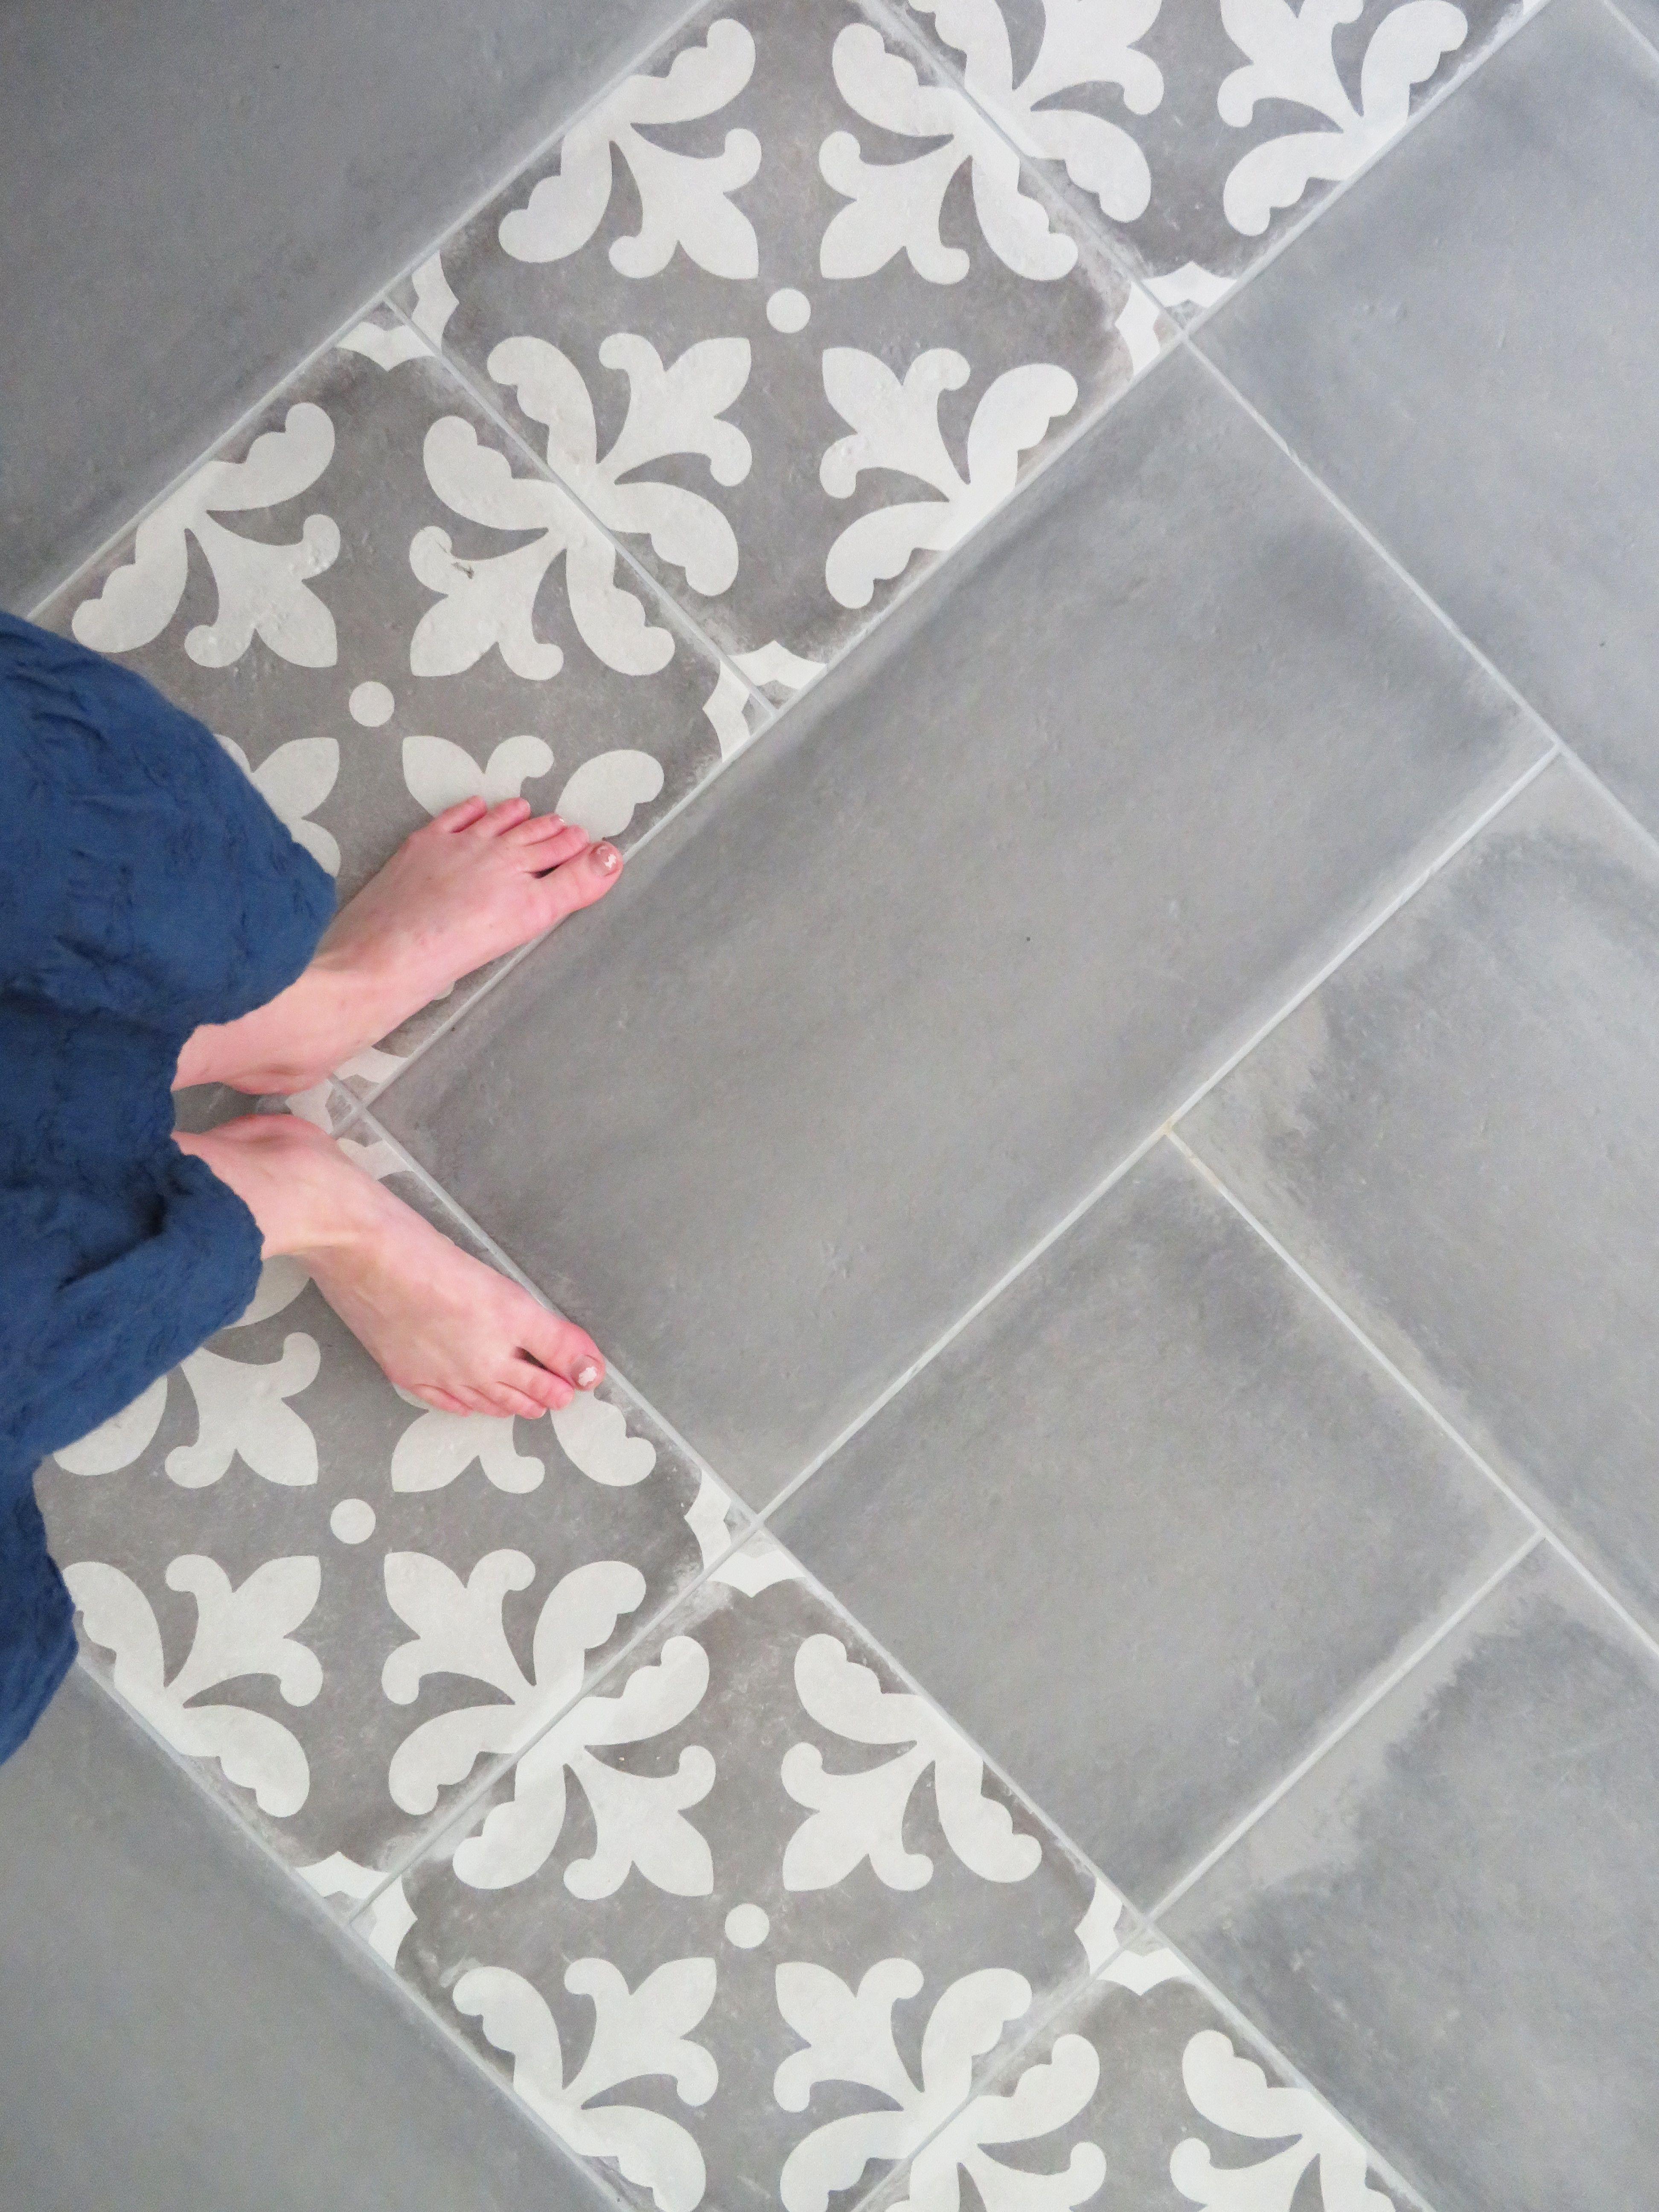 Tile Bat Floors With An Accent Strip